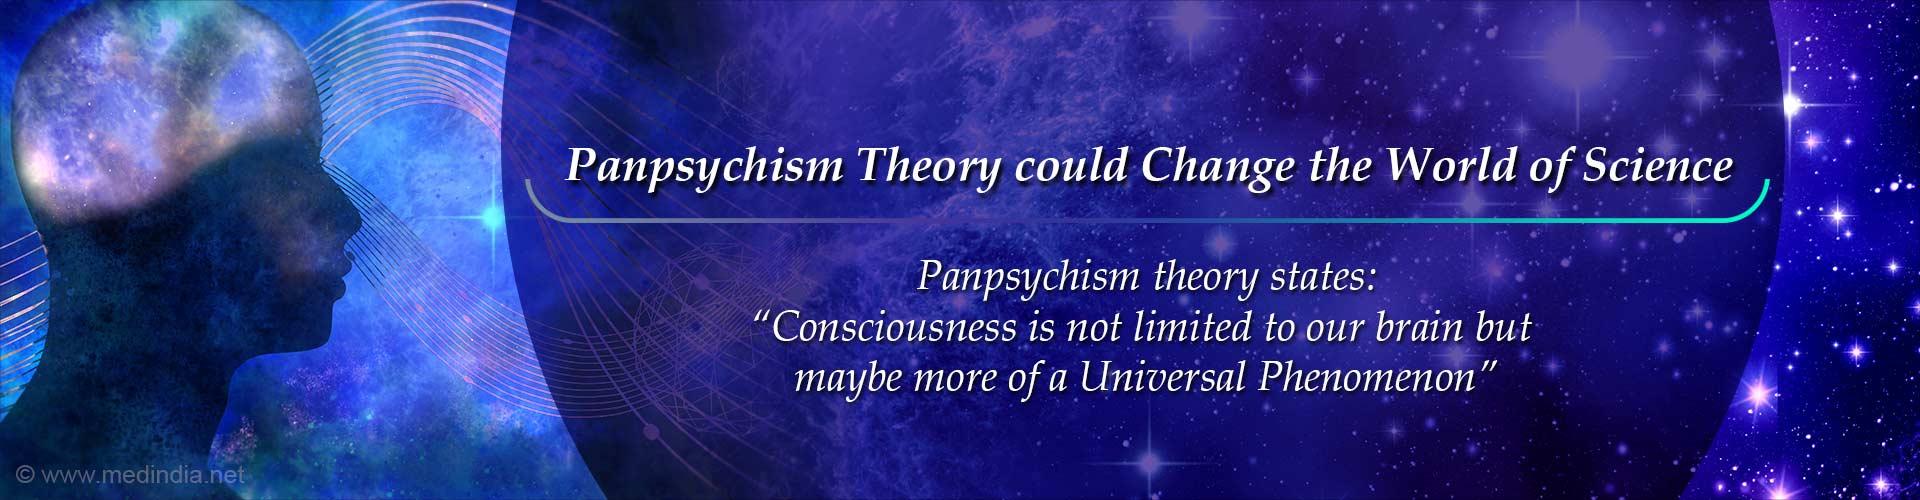 Panpsychism â€